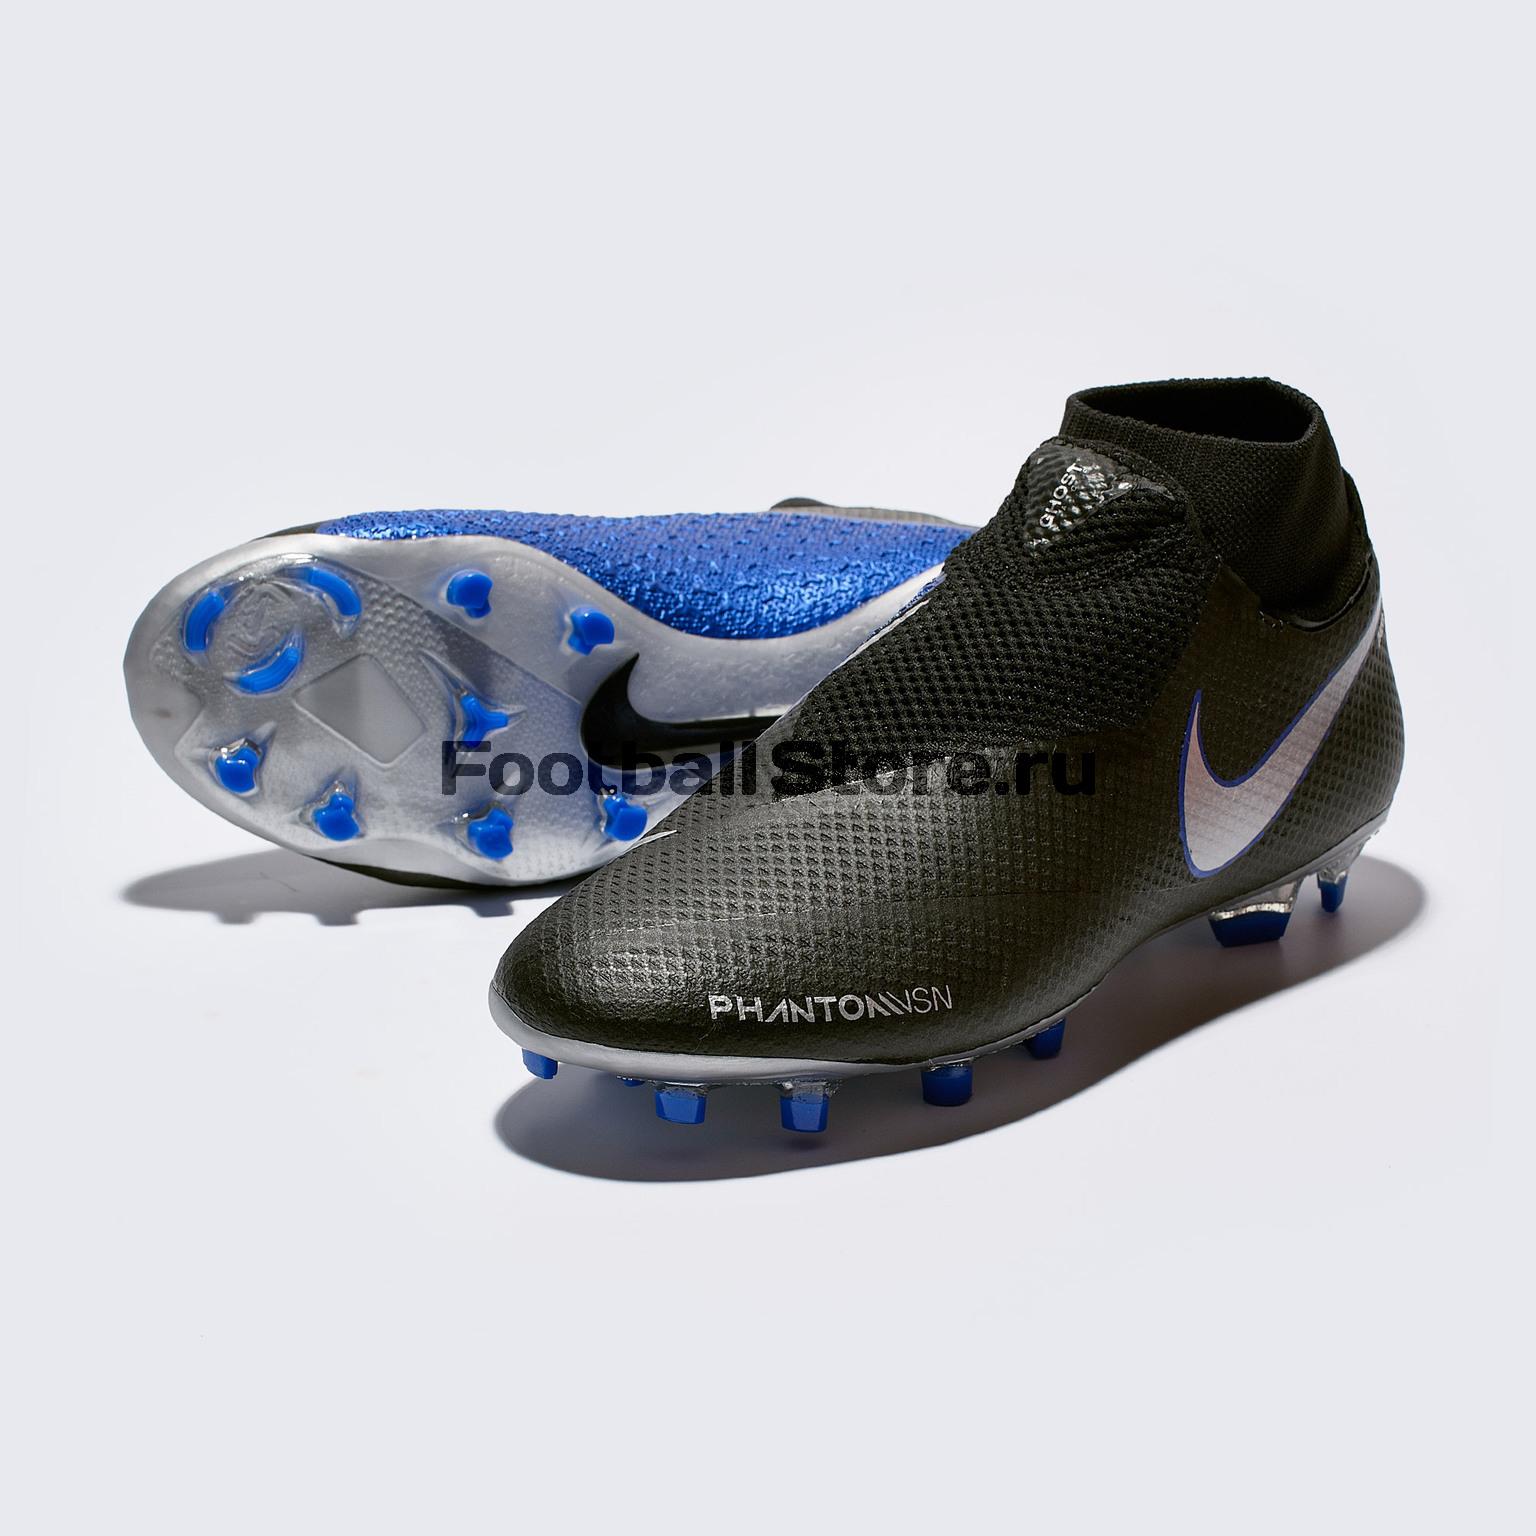 Бутсы Nike Phantom 3 Pro DF FG AO3266-004 бутсы nike mercurial victory iii fg 509128 800